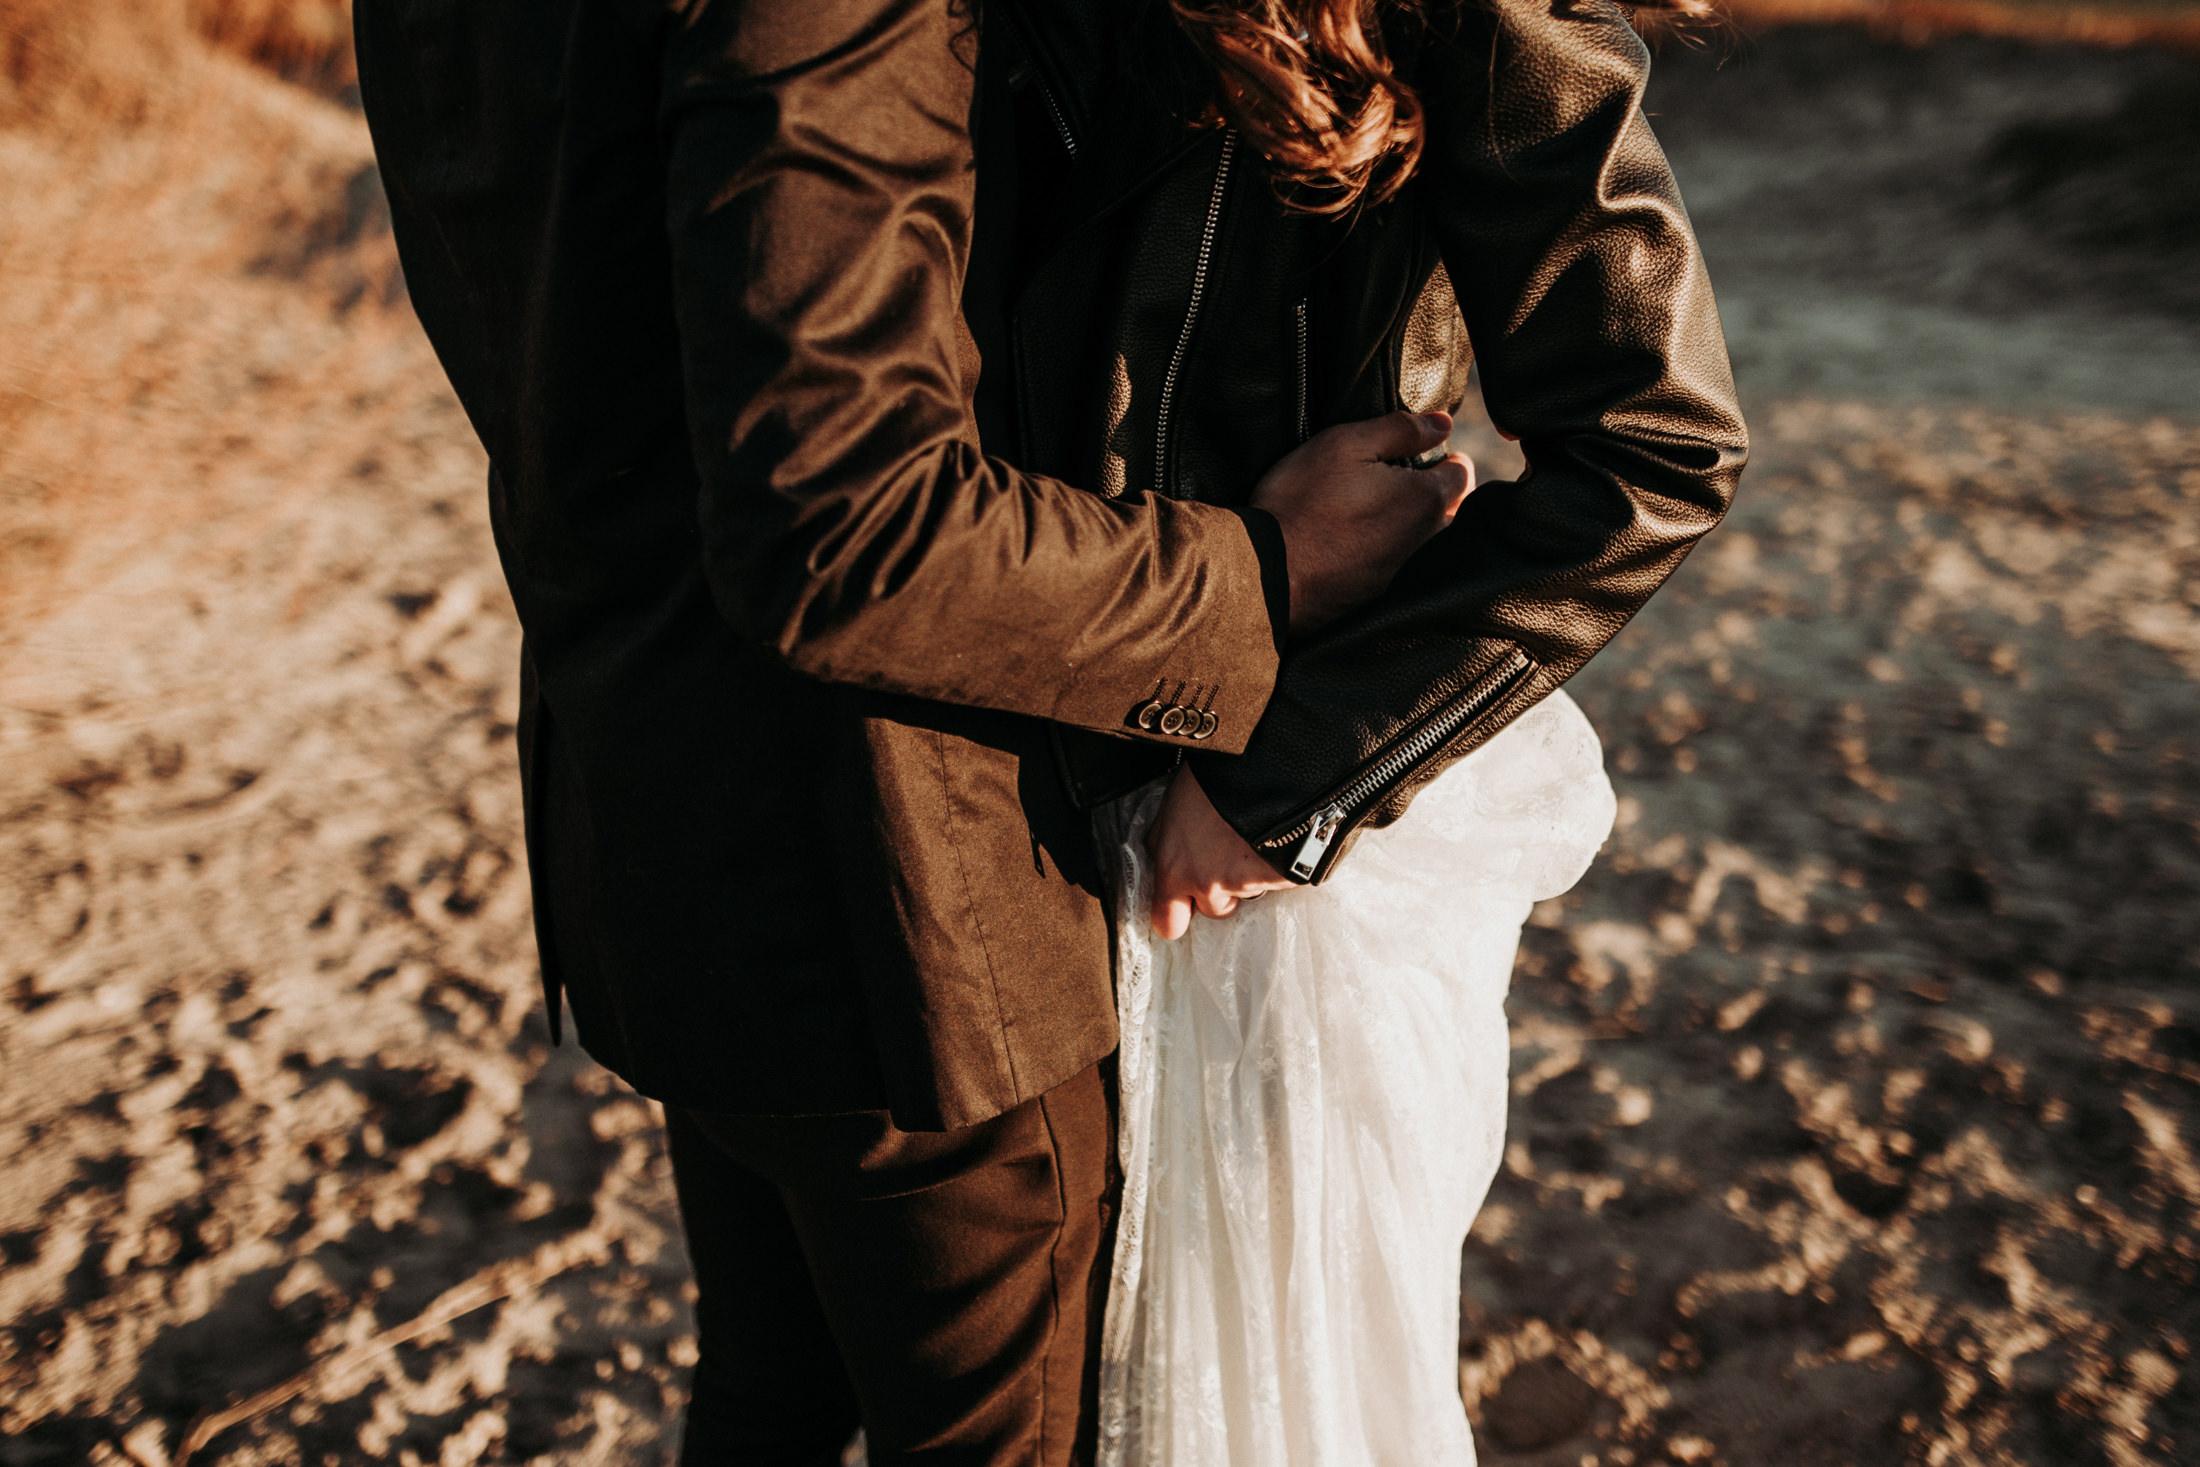 Wedding_Photographer_Mallorca_Daniela-Marquardt_Photography_CanaryIslands_Lanzarote_Iceland_Tuskany_Santorini_Portugal_Schweiz_Austria_Bayern_Elopement_Hochzeitsfotograf_Norddeichich_12